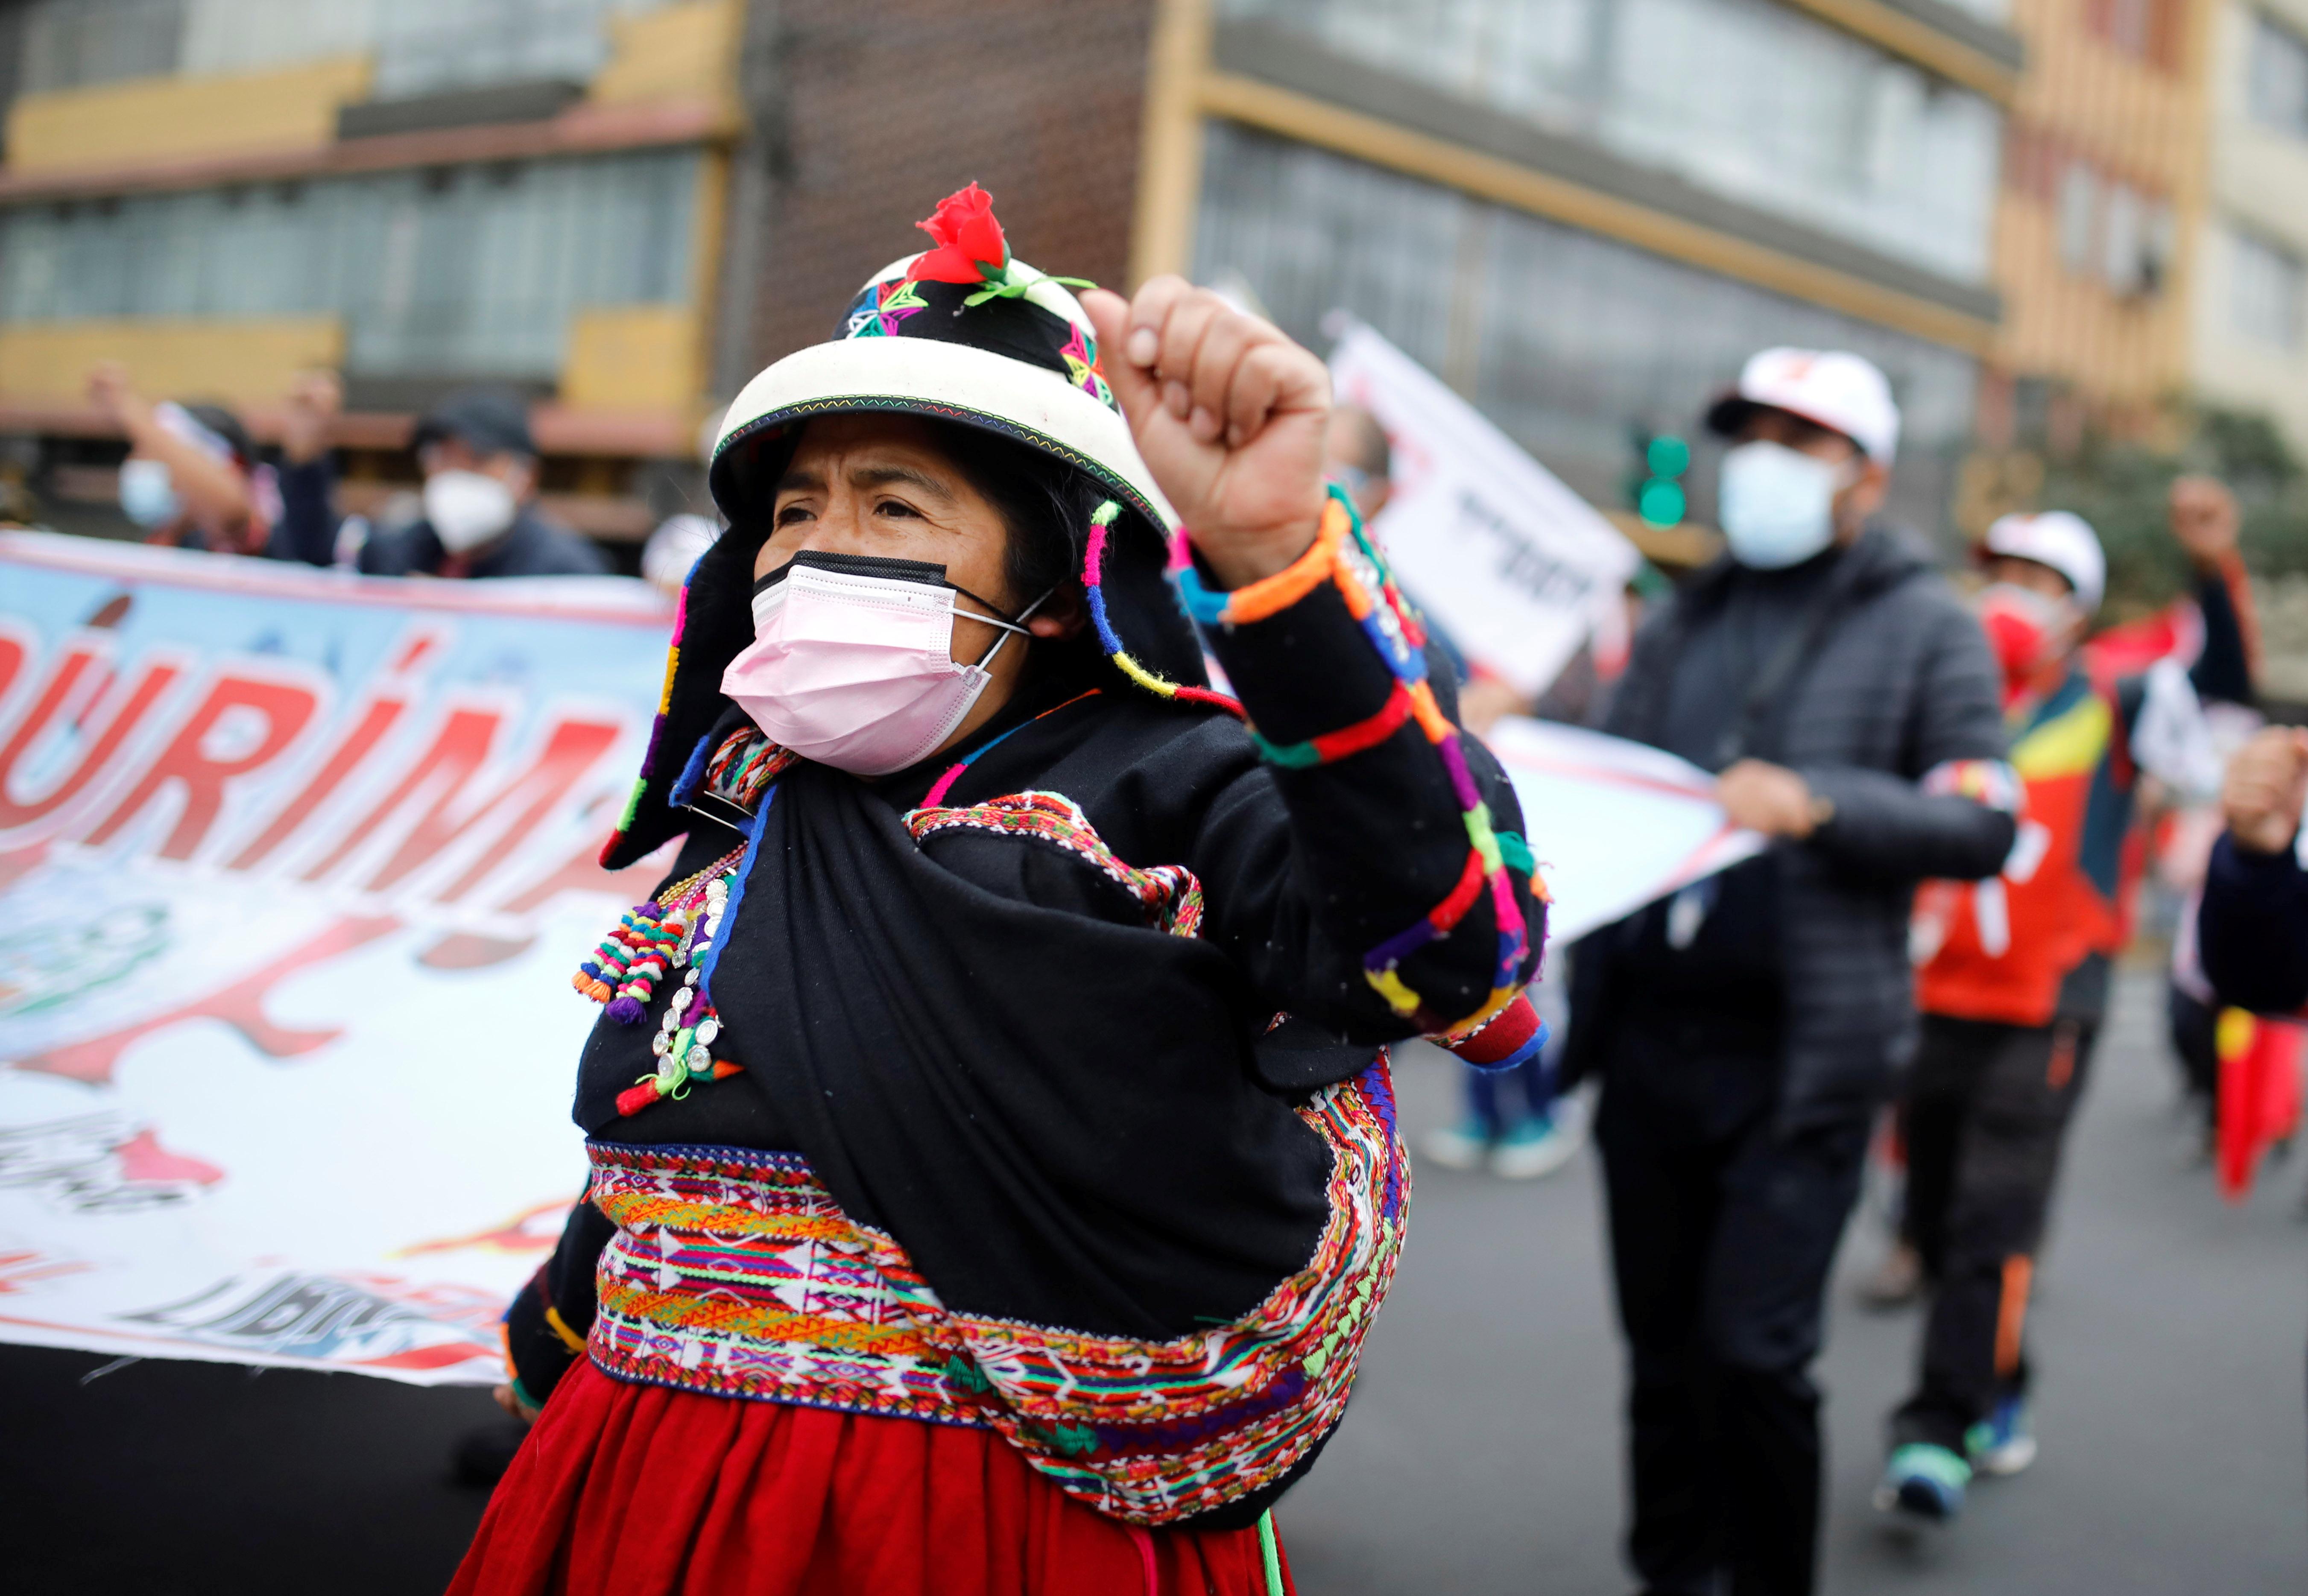 Supporters of Peru's presidential candidate Pedro Castillo march in Lima, Peru June 26, 2021. REUTERS/Sebastian Castaneda